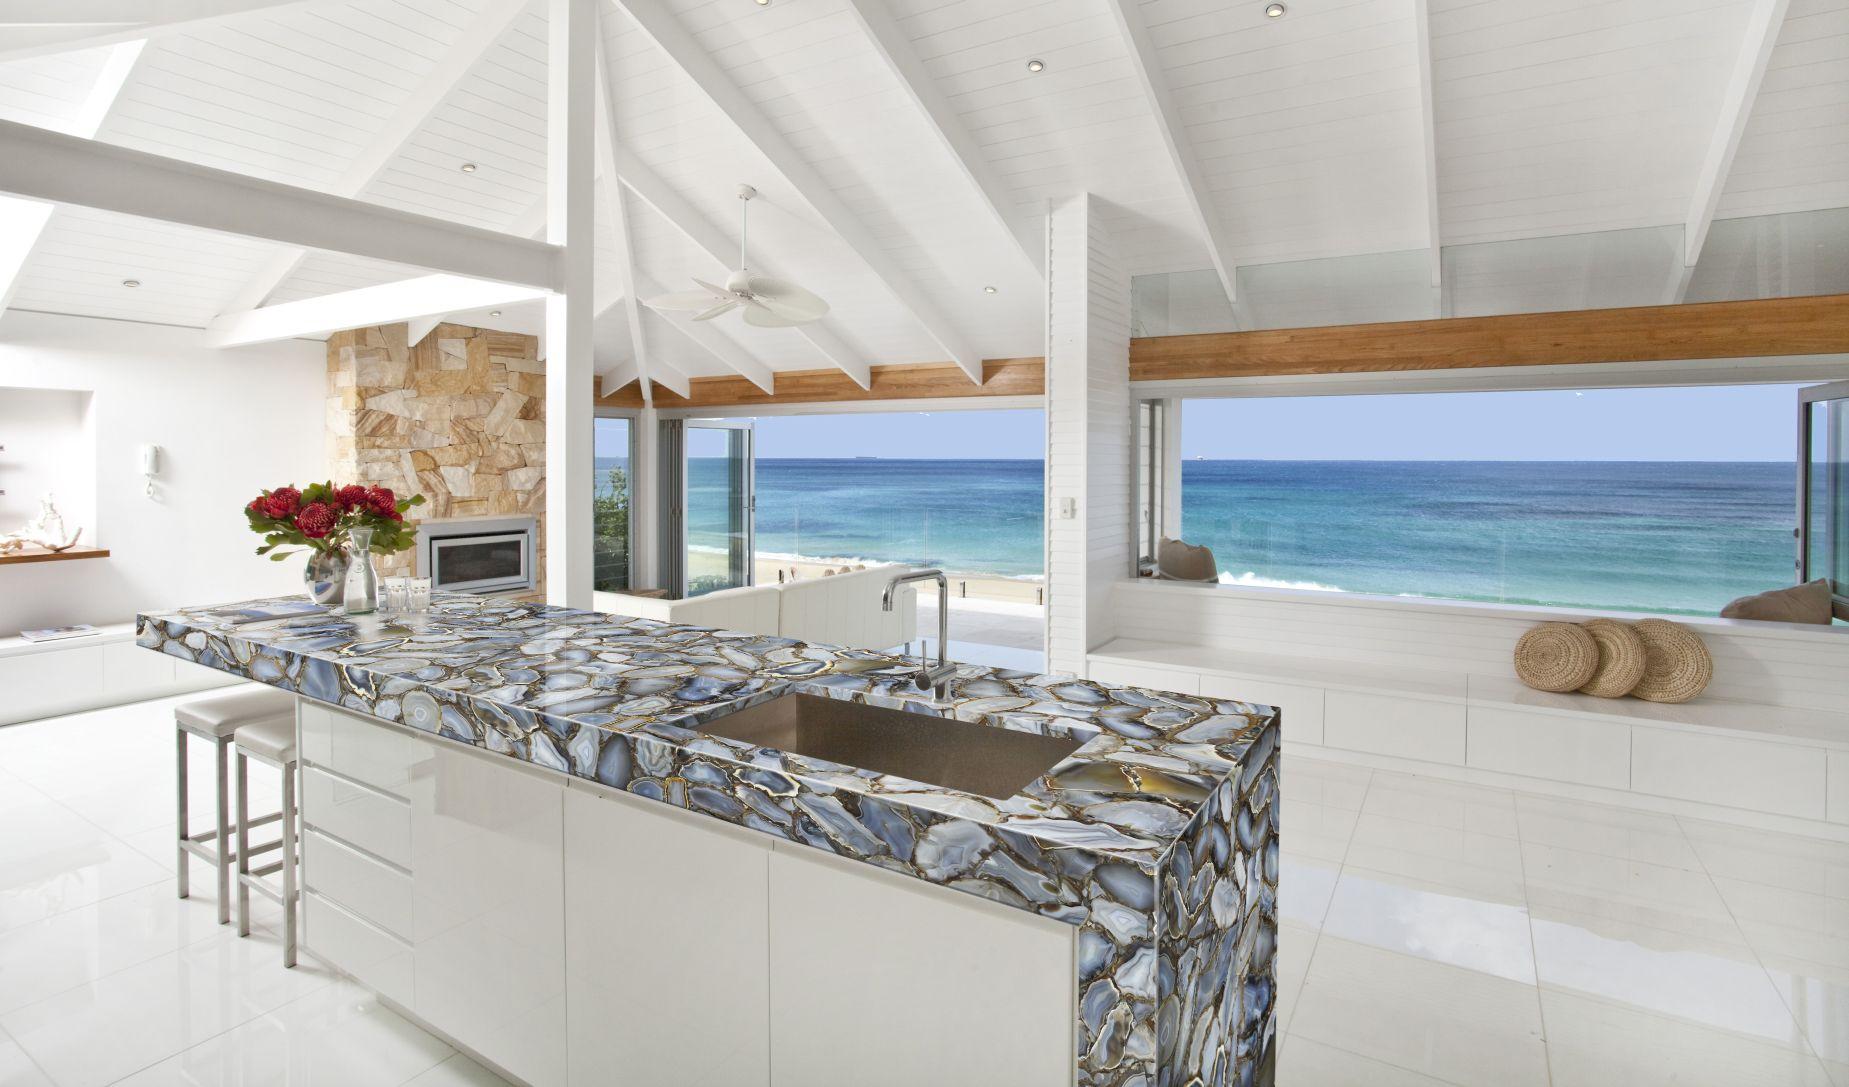 agate rubane kitchen countertops.jpg